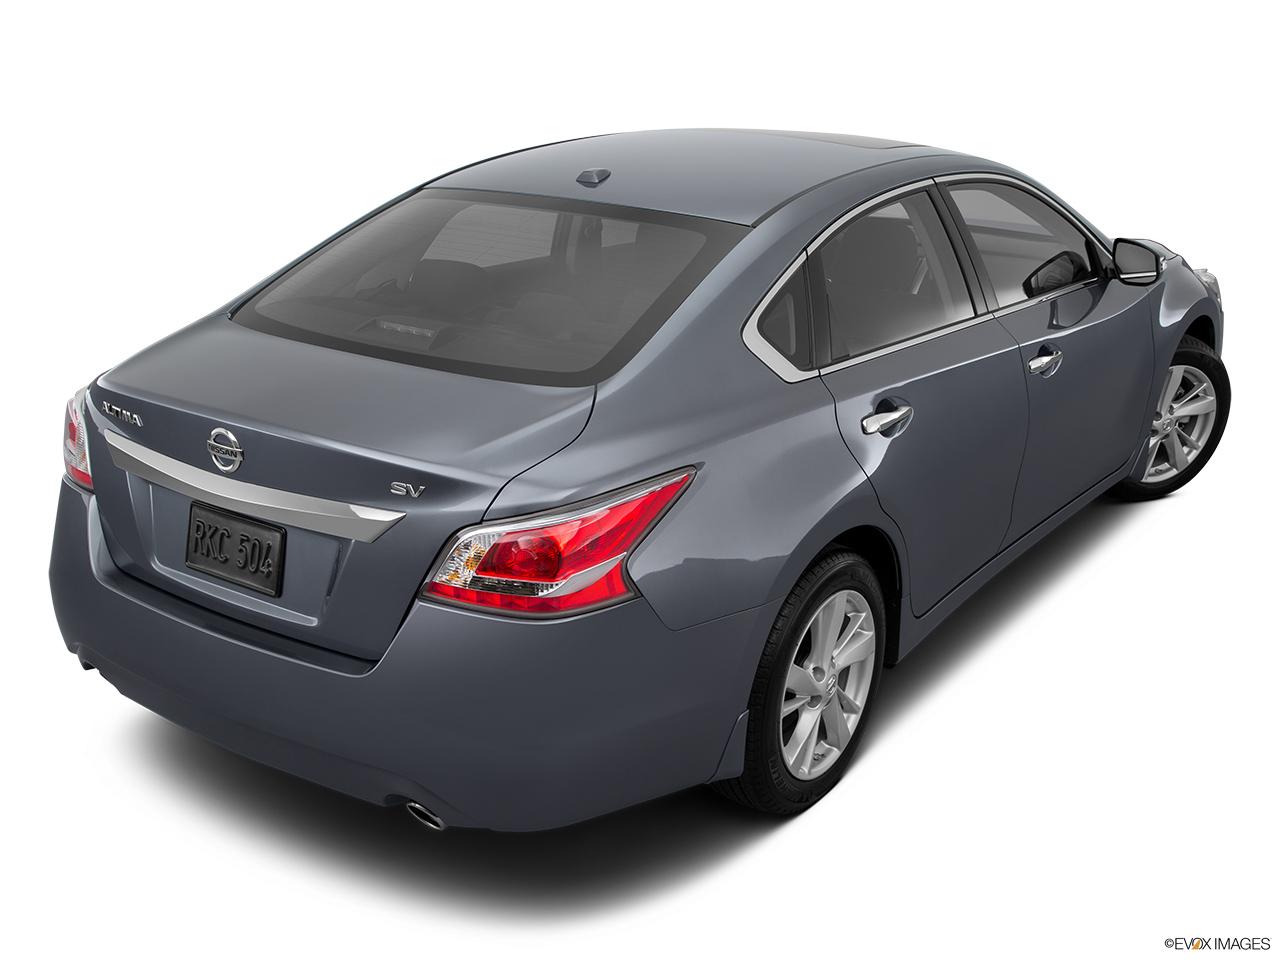 nissan sv oklahoma city pre altima fwd owned inventory sedan used